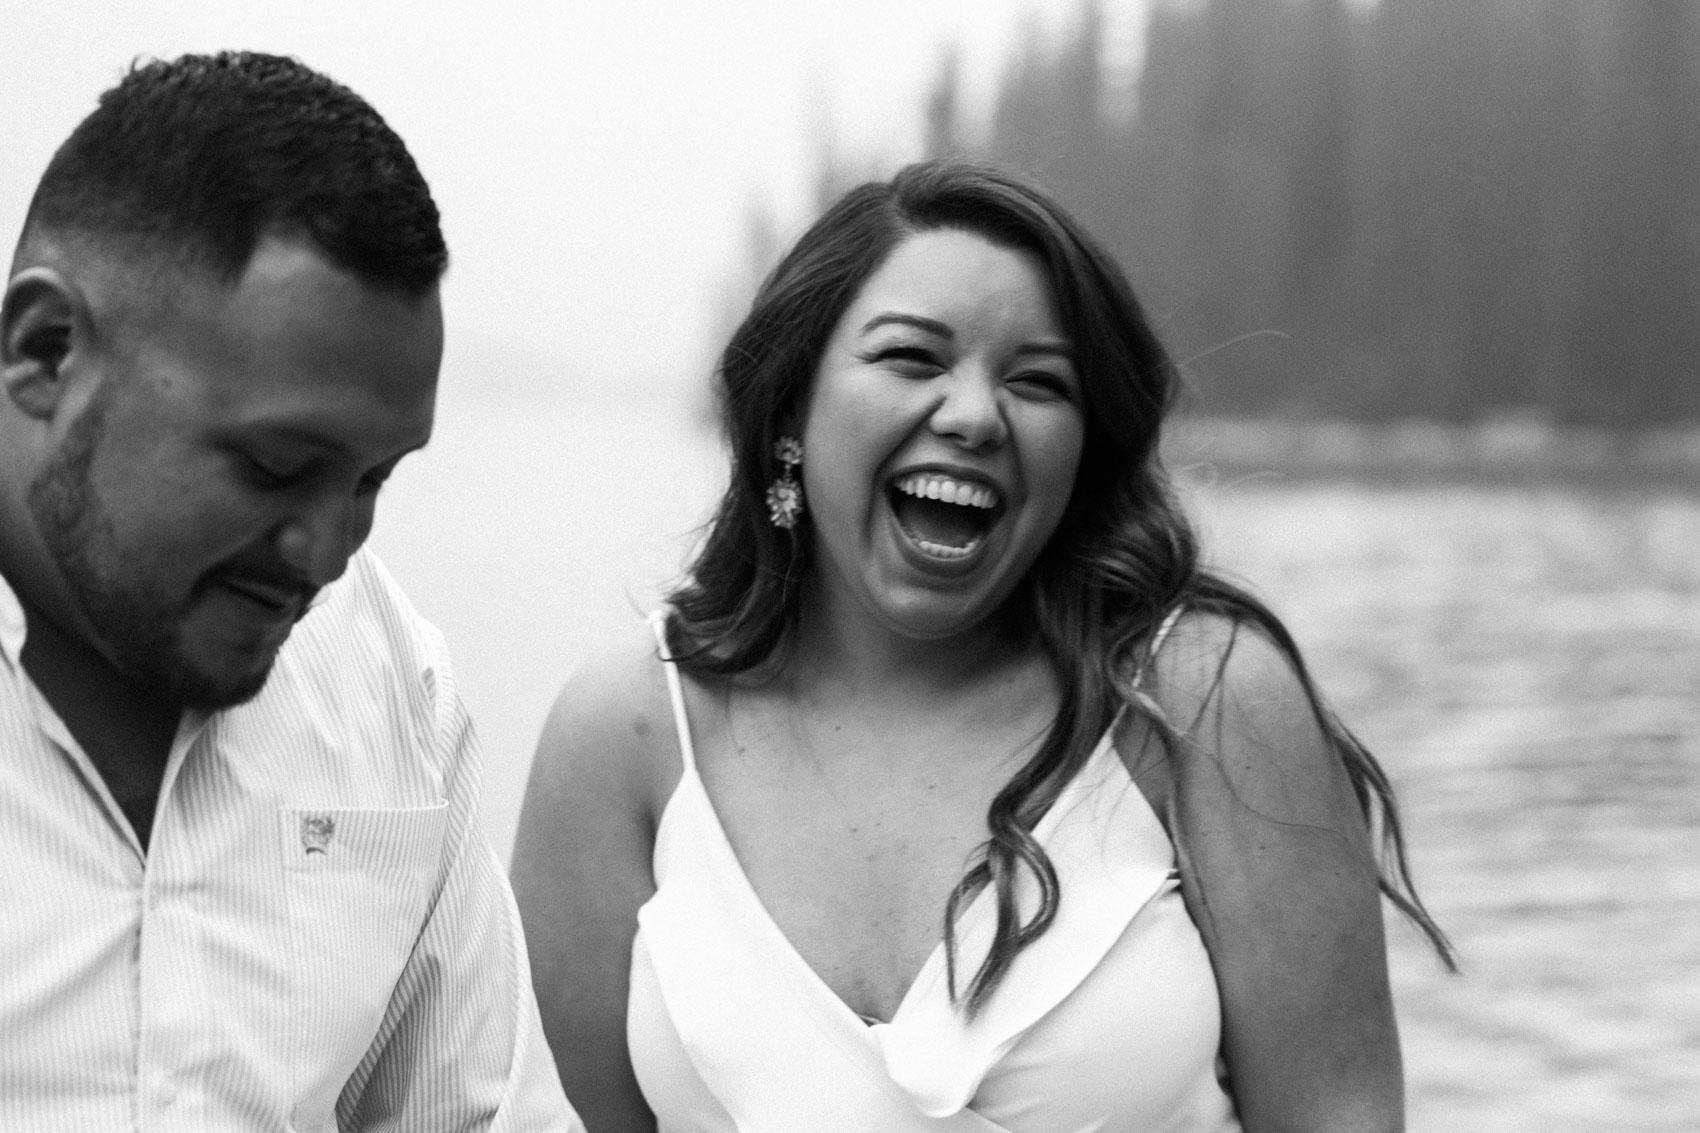 Lake Louise Mountain Engagement Photographer Moraine Lake Wedding Jennie Guenard Photography-13.jpg